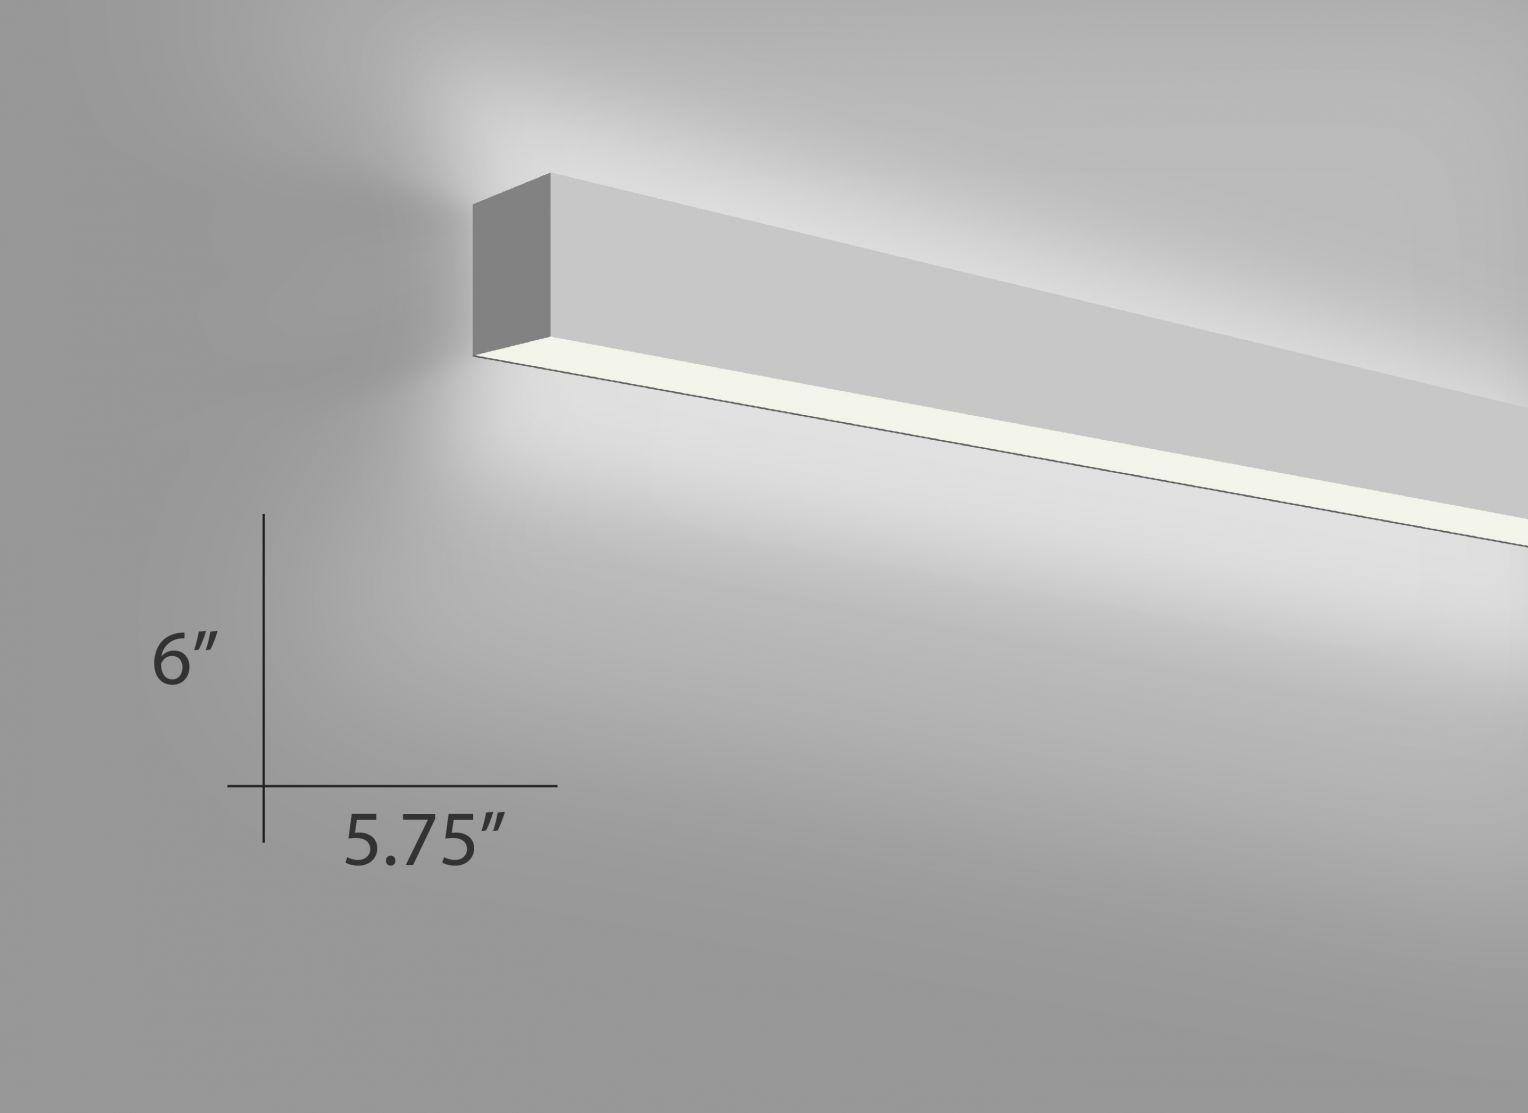 Alcon lighting beam 66 wall mount 6019 w architectural linear details the alcon lighting beam 66 wall mount aloadofball Choice Image